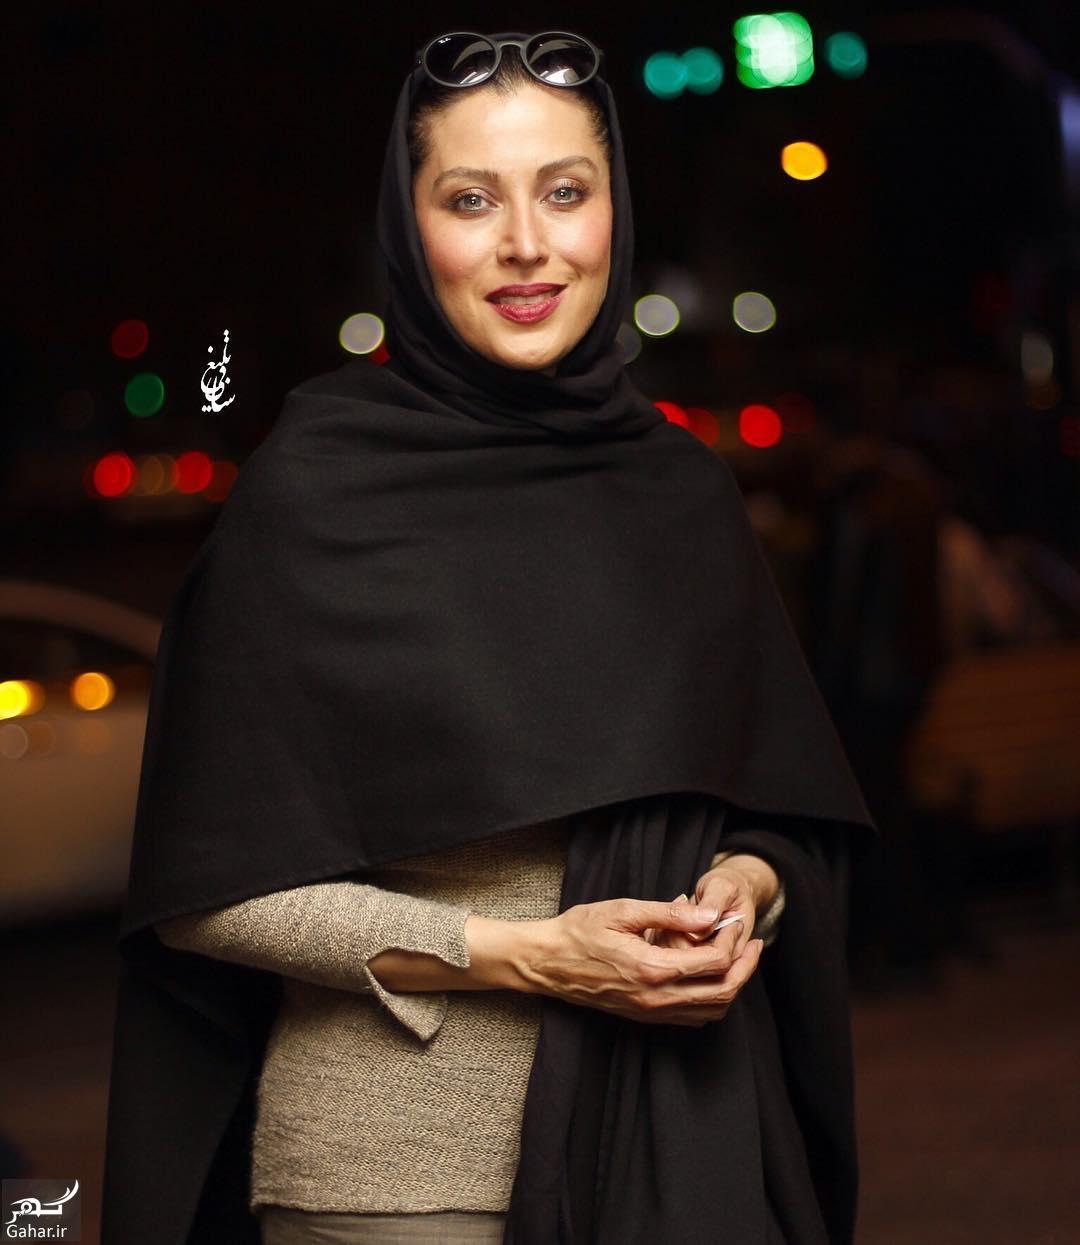 994417 Gahar ir بازیگران در اکران مردمی فیلم «تیک آف» + عکس